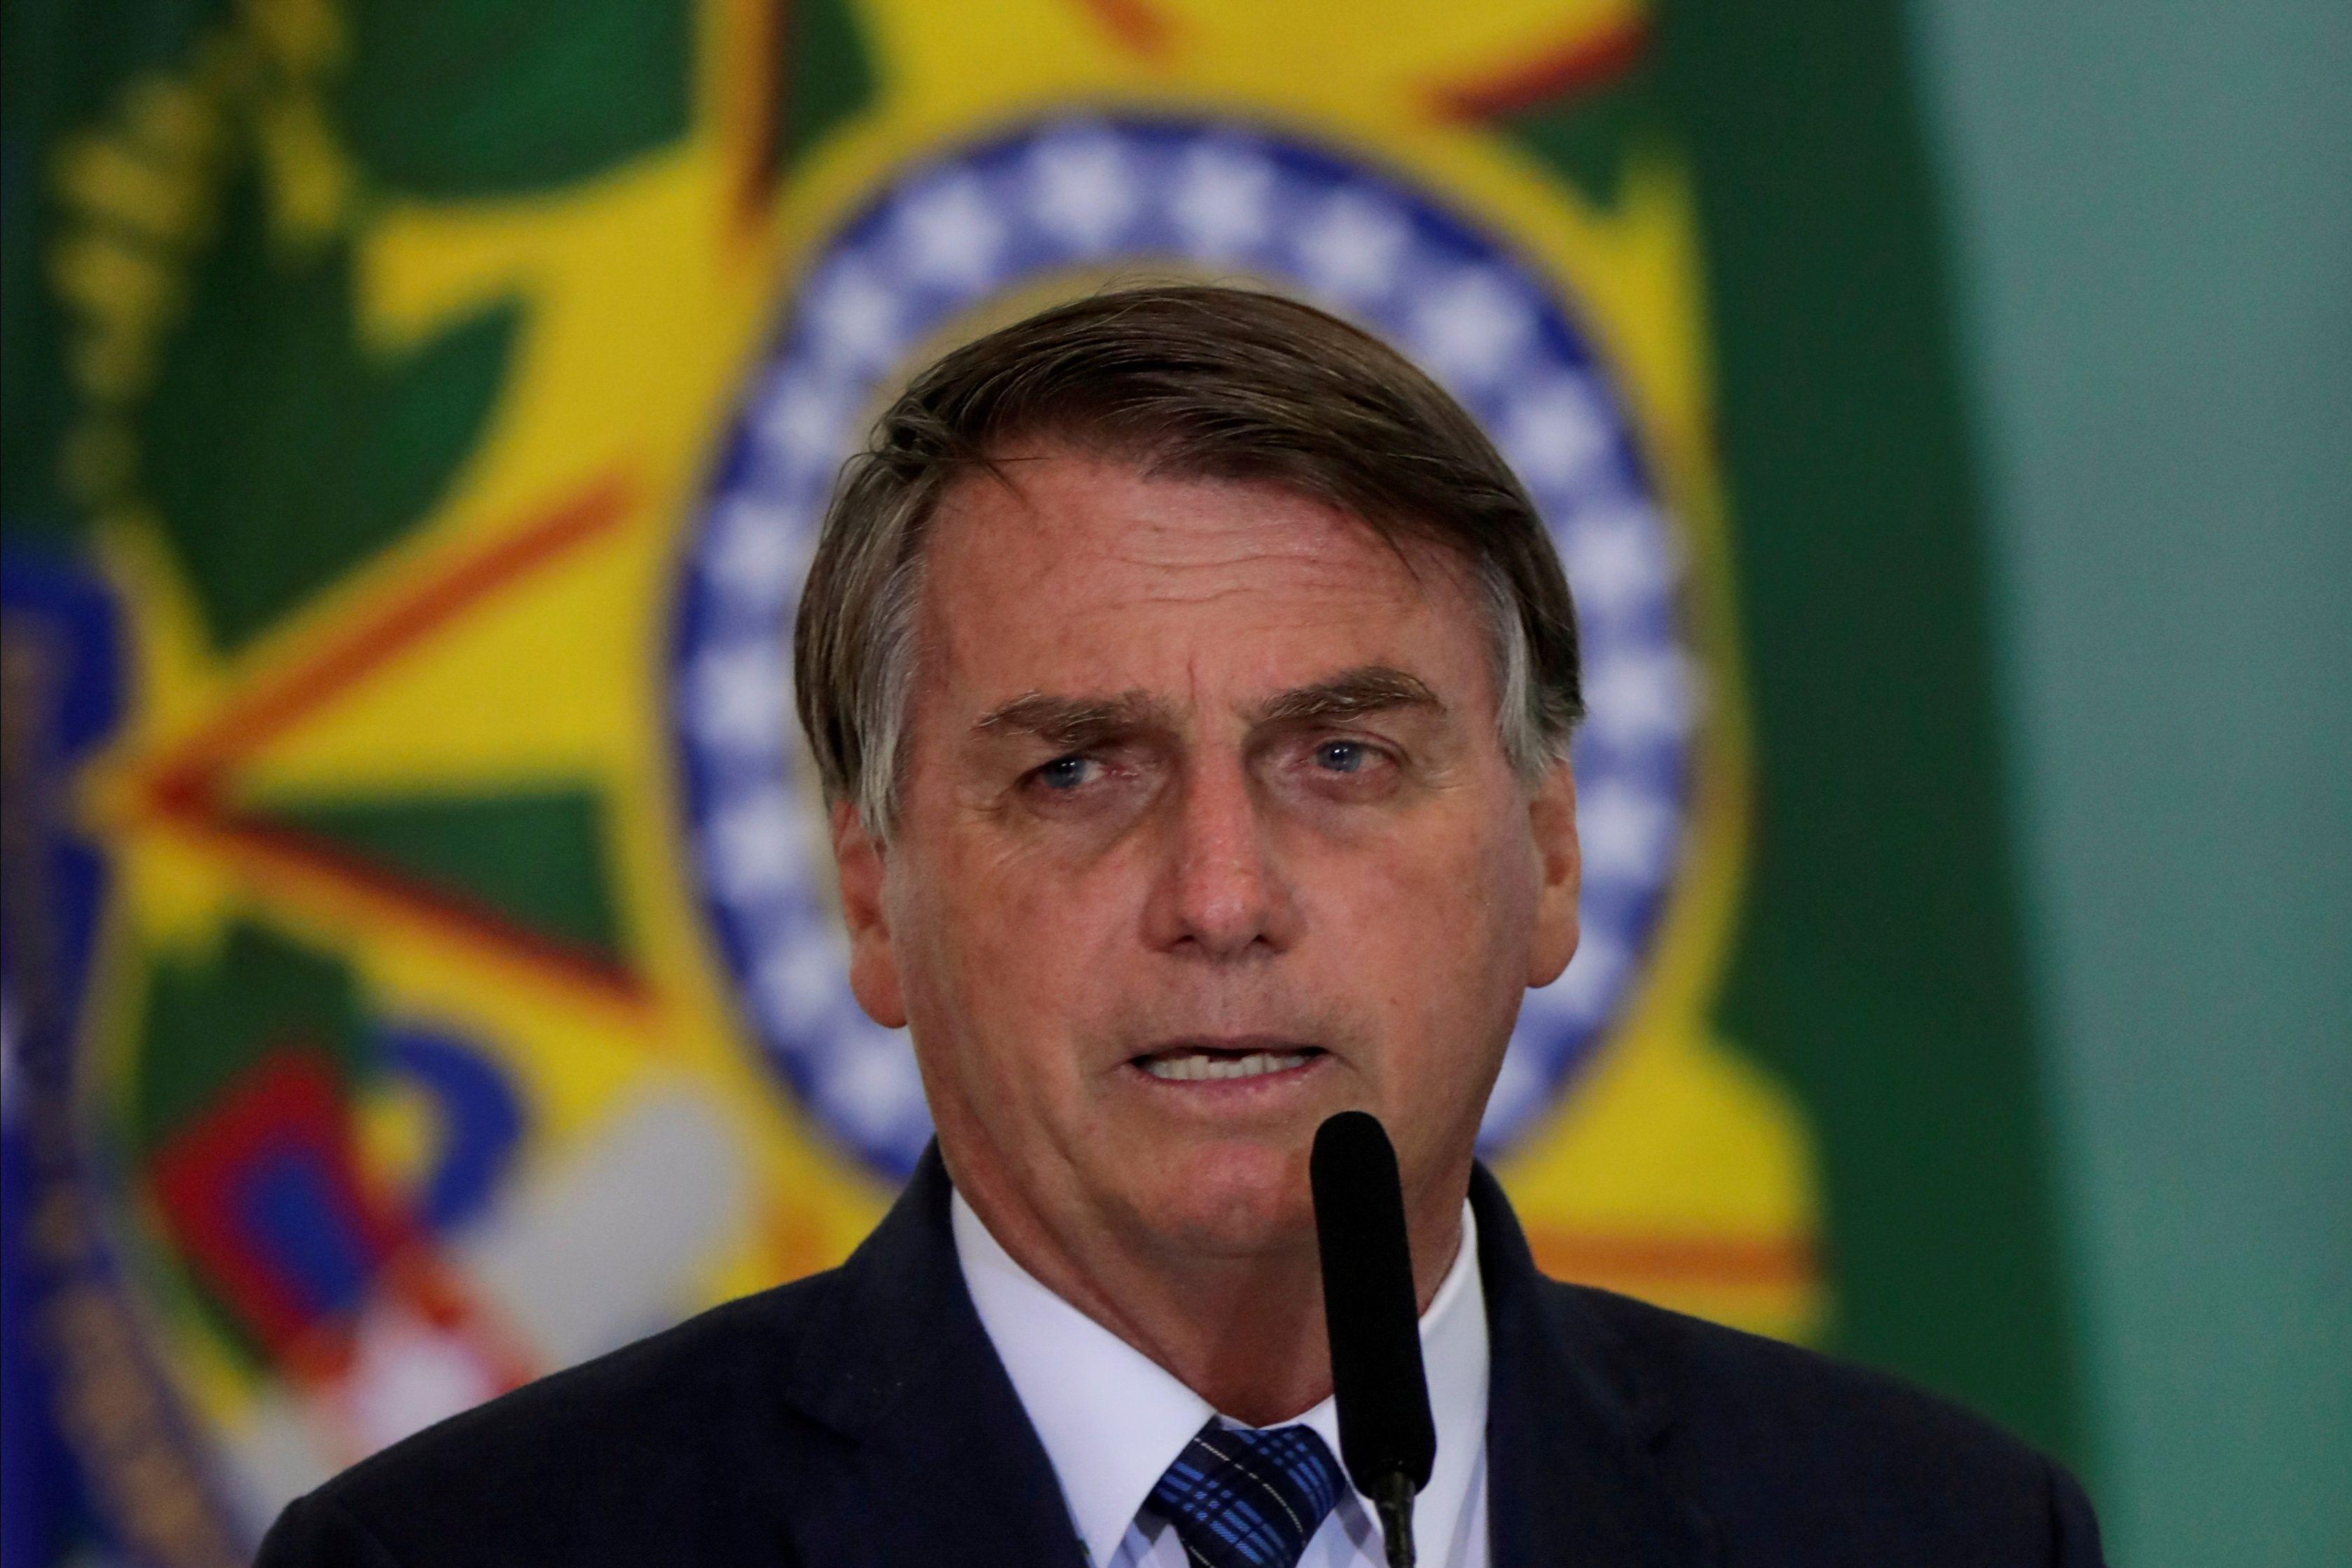 El presidente de Brasil, Jair Bolsonaro. Foto: REUTERS/Ueslei Marcelino